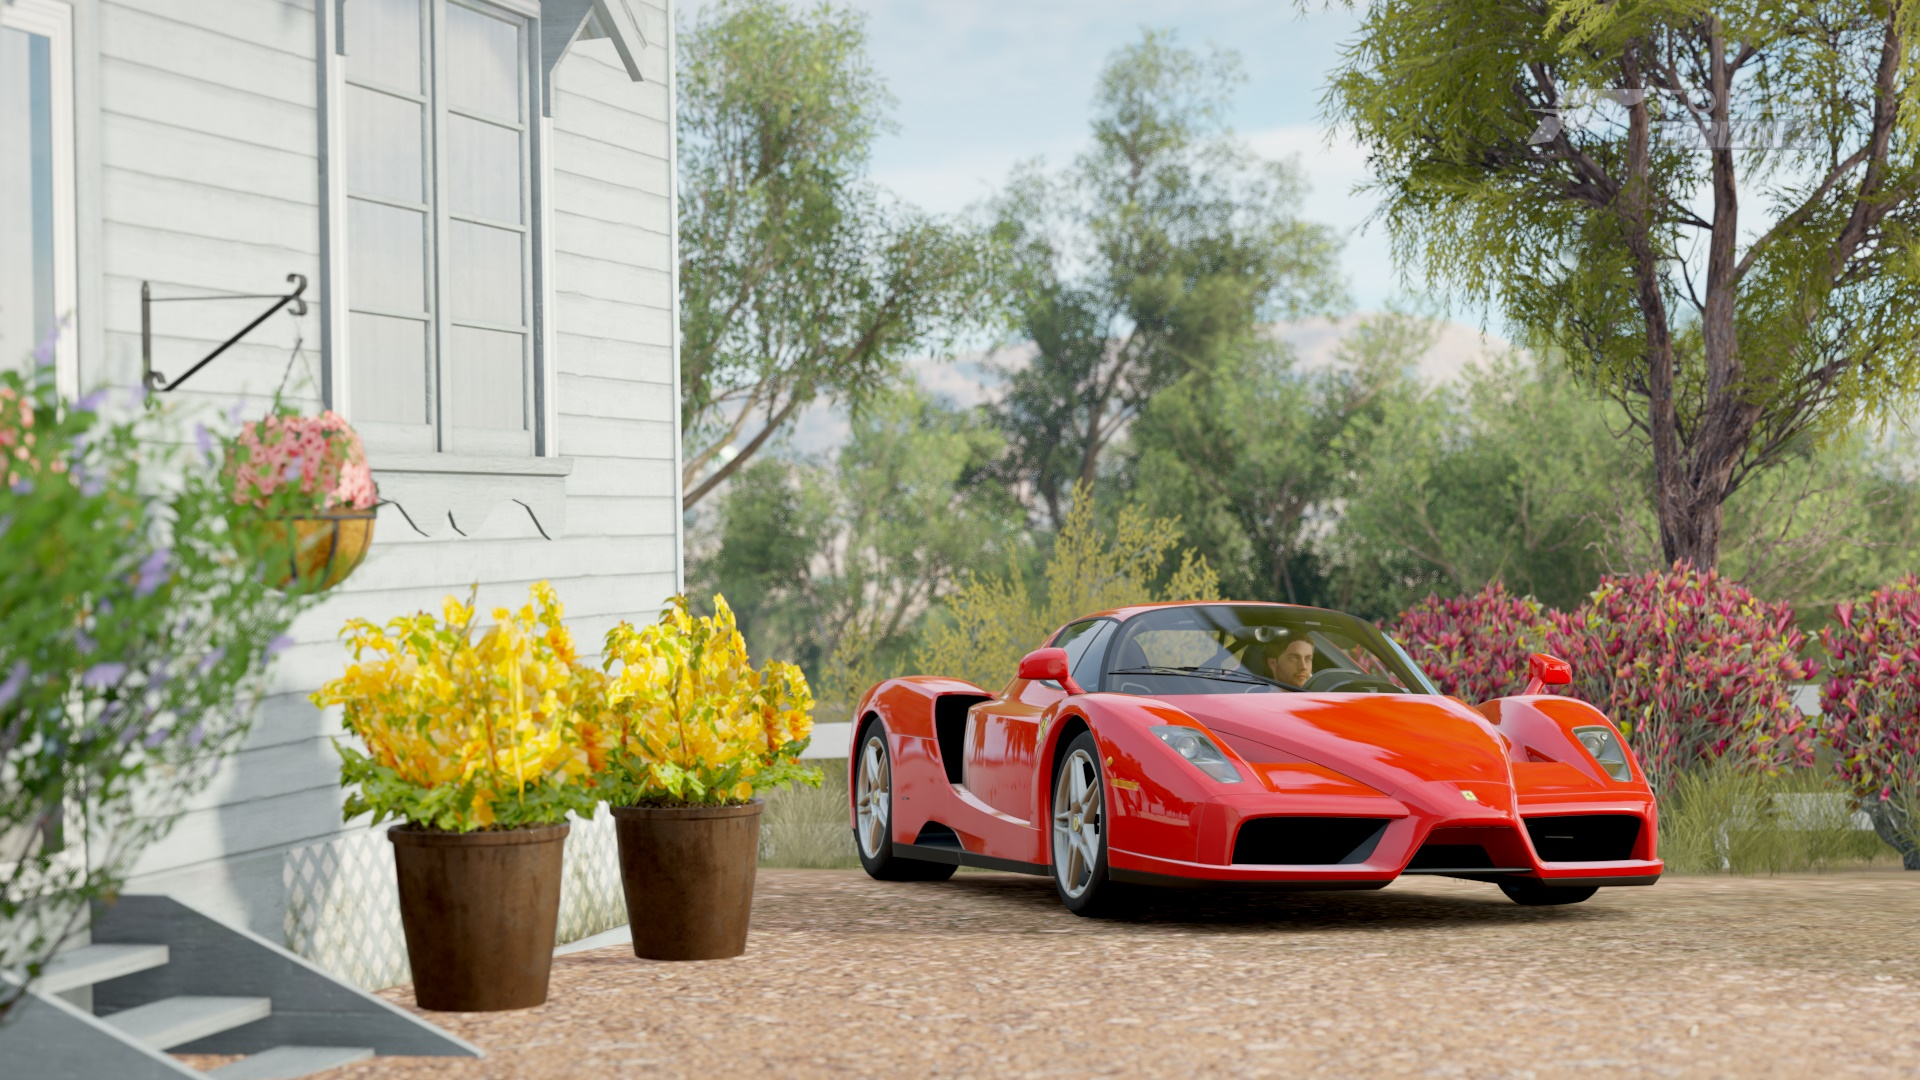 5103a296-3186-4fdd-9a95-a39003da5c67.jpg?n=2002%20Ferrari%20Enzo%20Ferrari%20Pebb Fabulous Ferrari Mondial 8 Super Elite Cars Trend